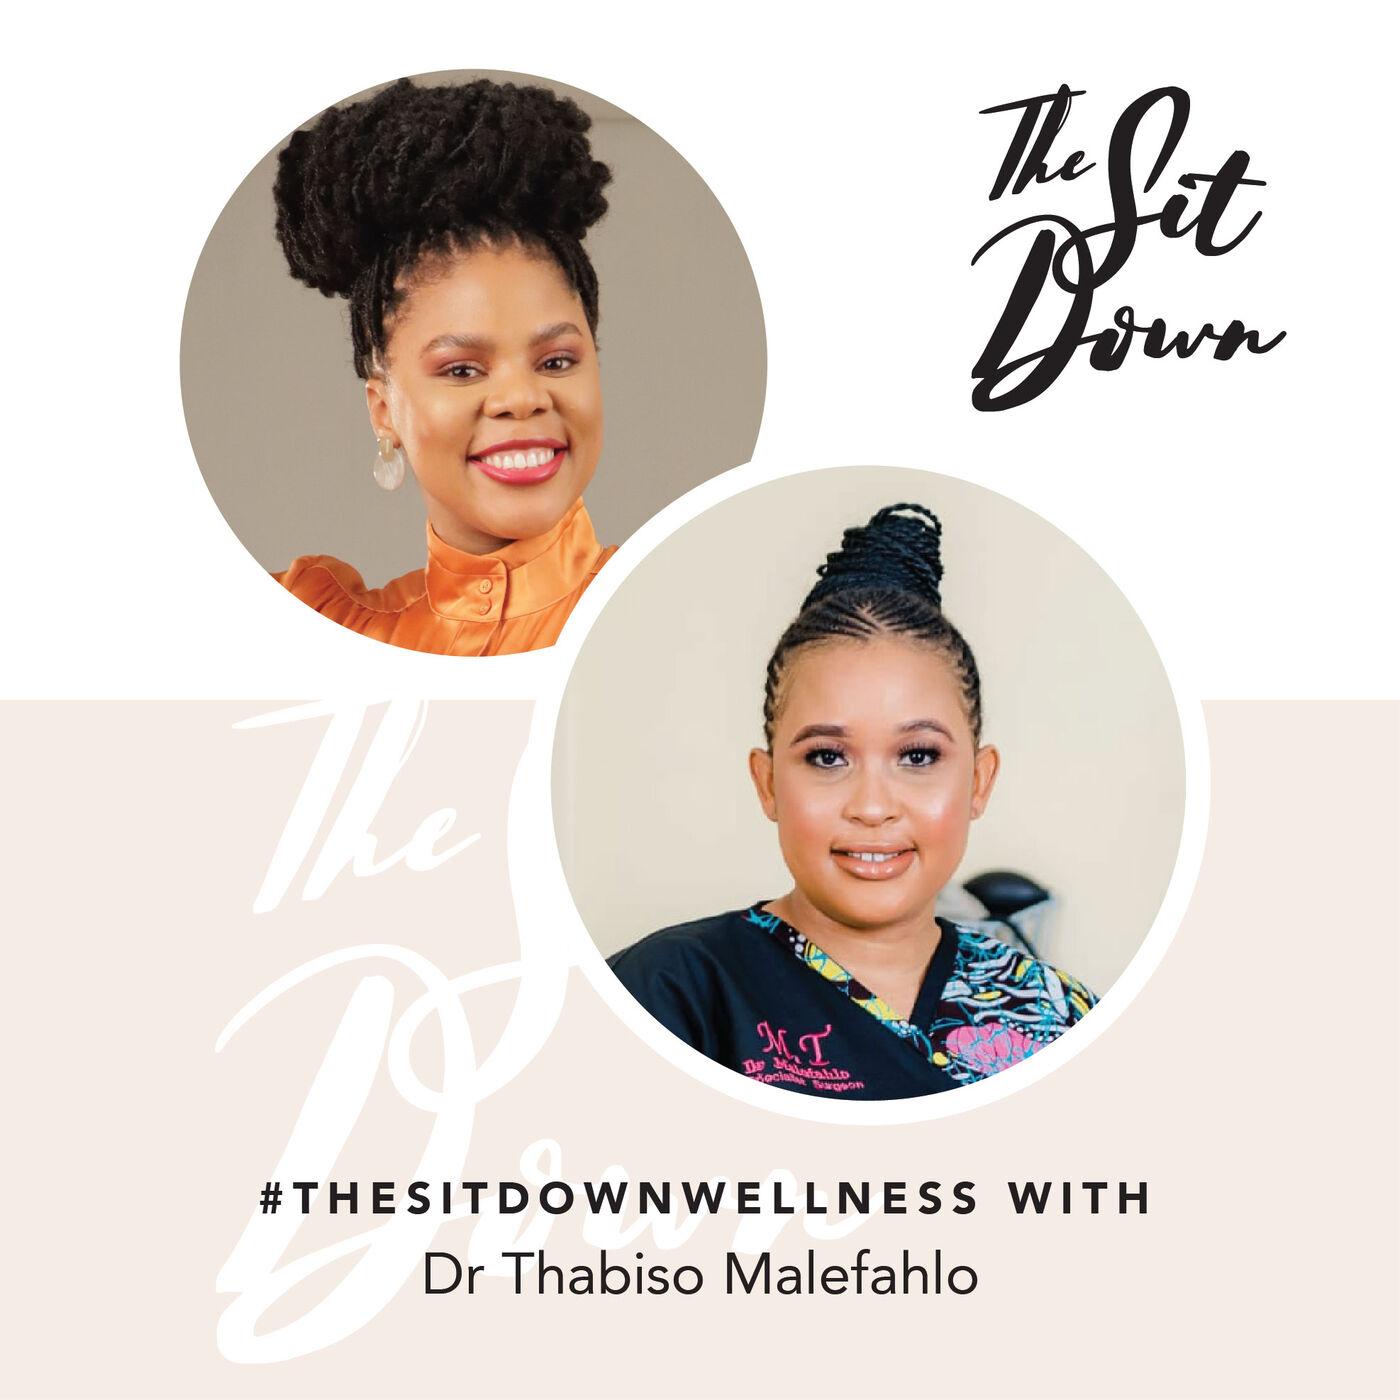 #TheSitDownWellness | Dr Thabiso Malefahlo